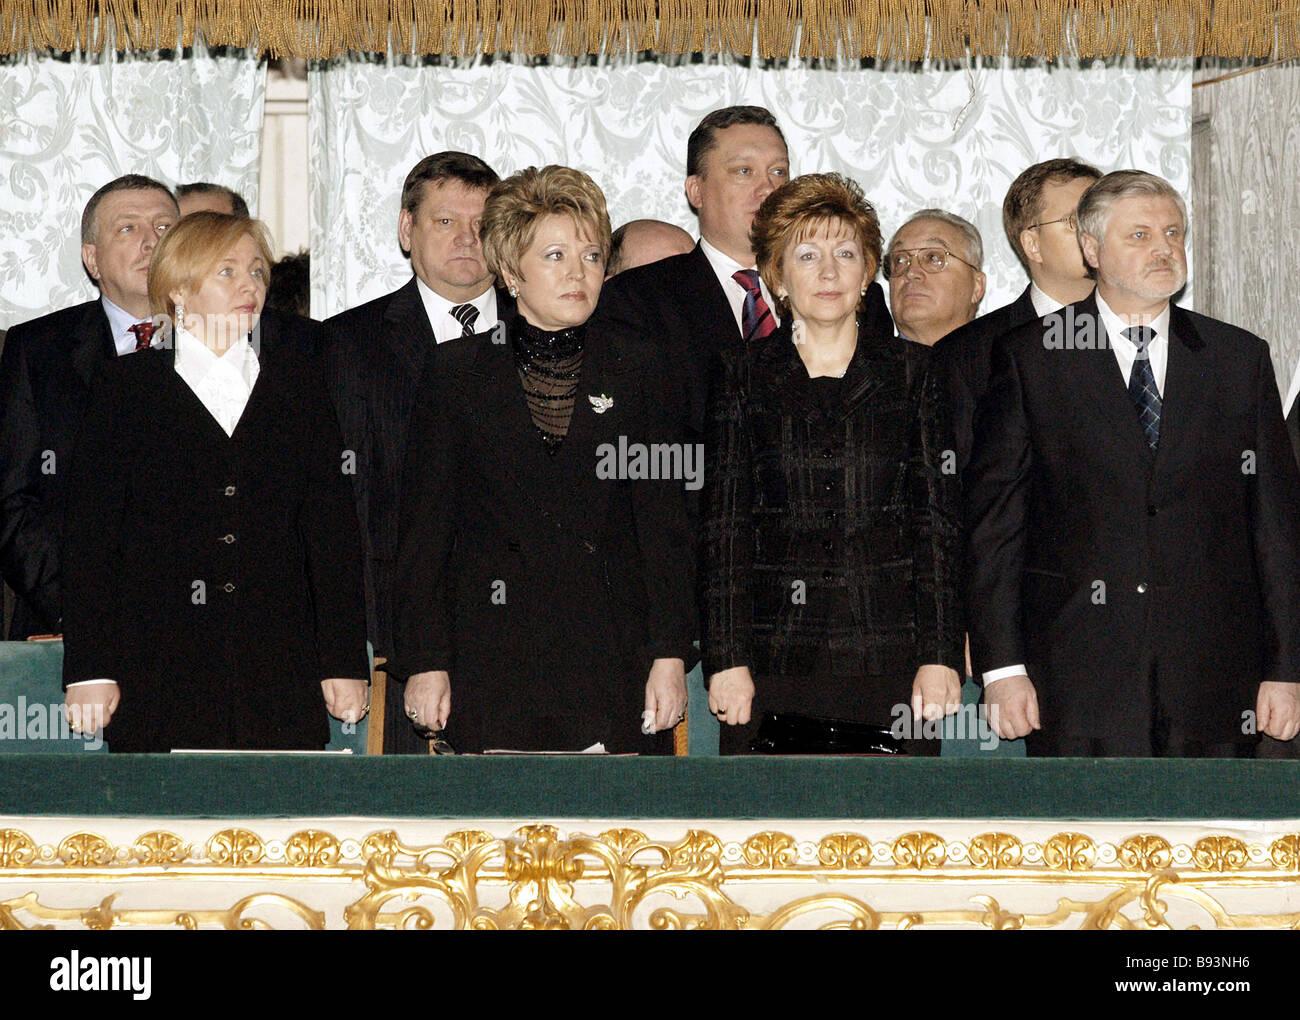 In pew del teatro Mariinsky da sinistra a destra prima fila